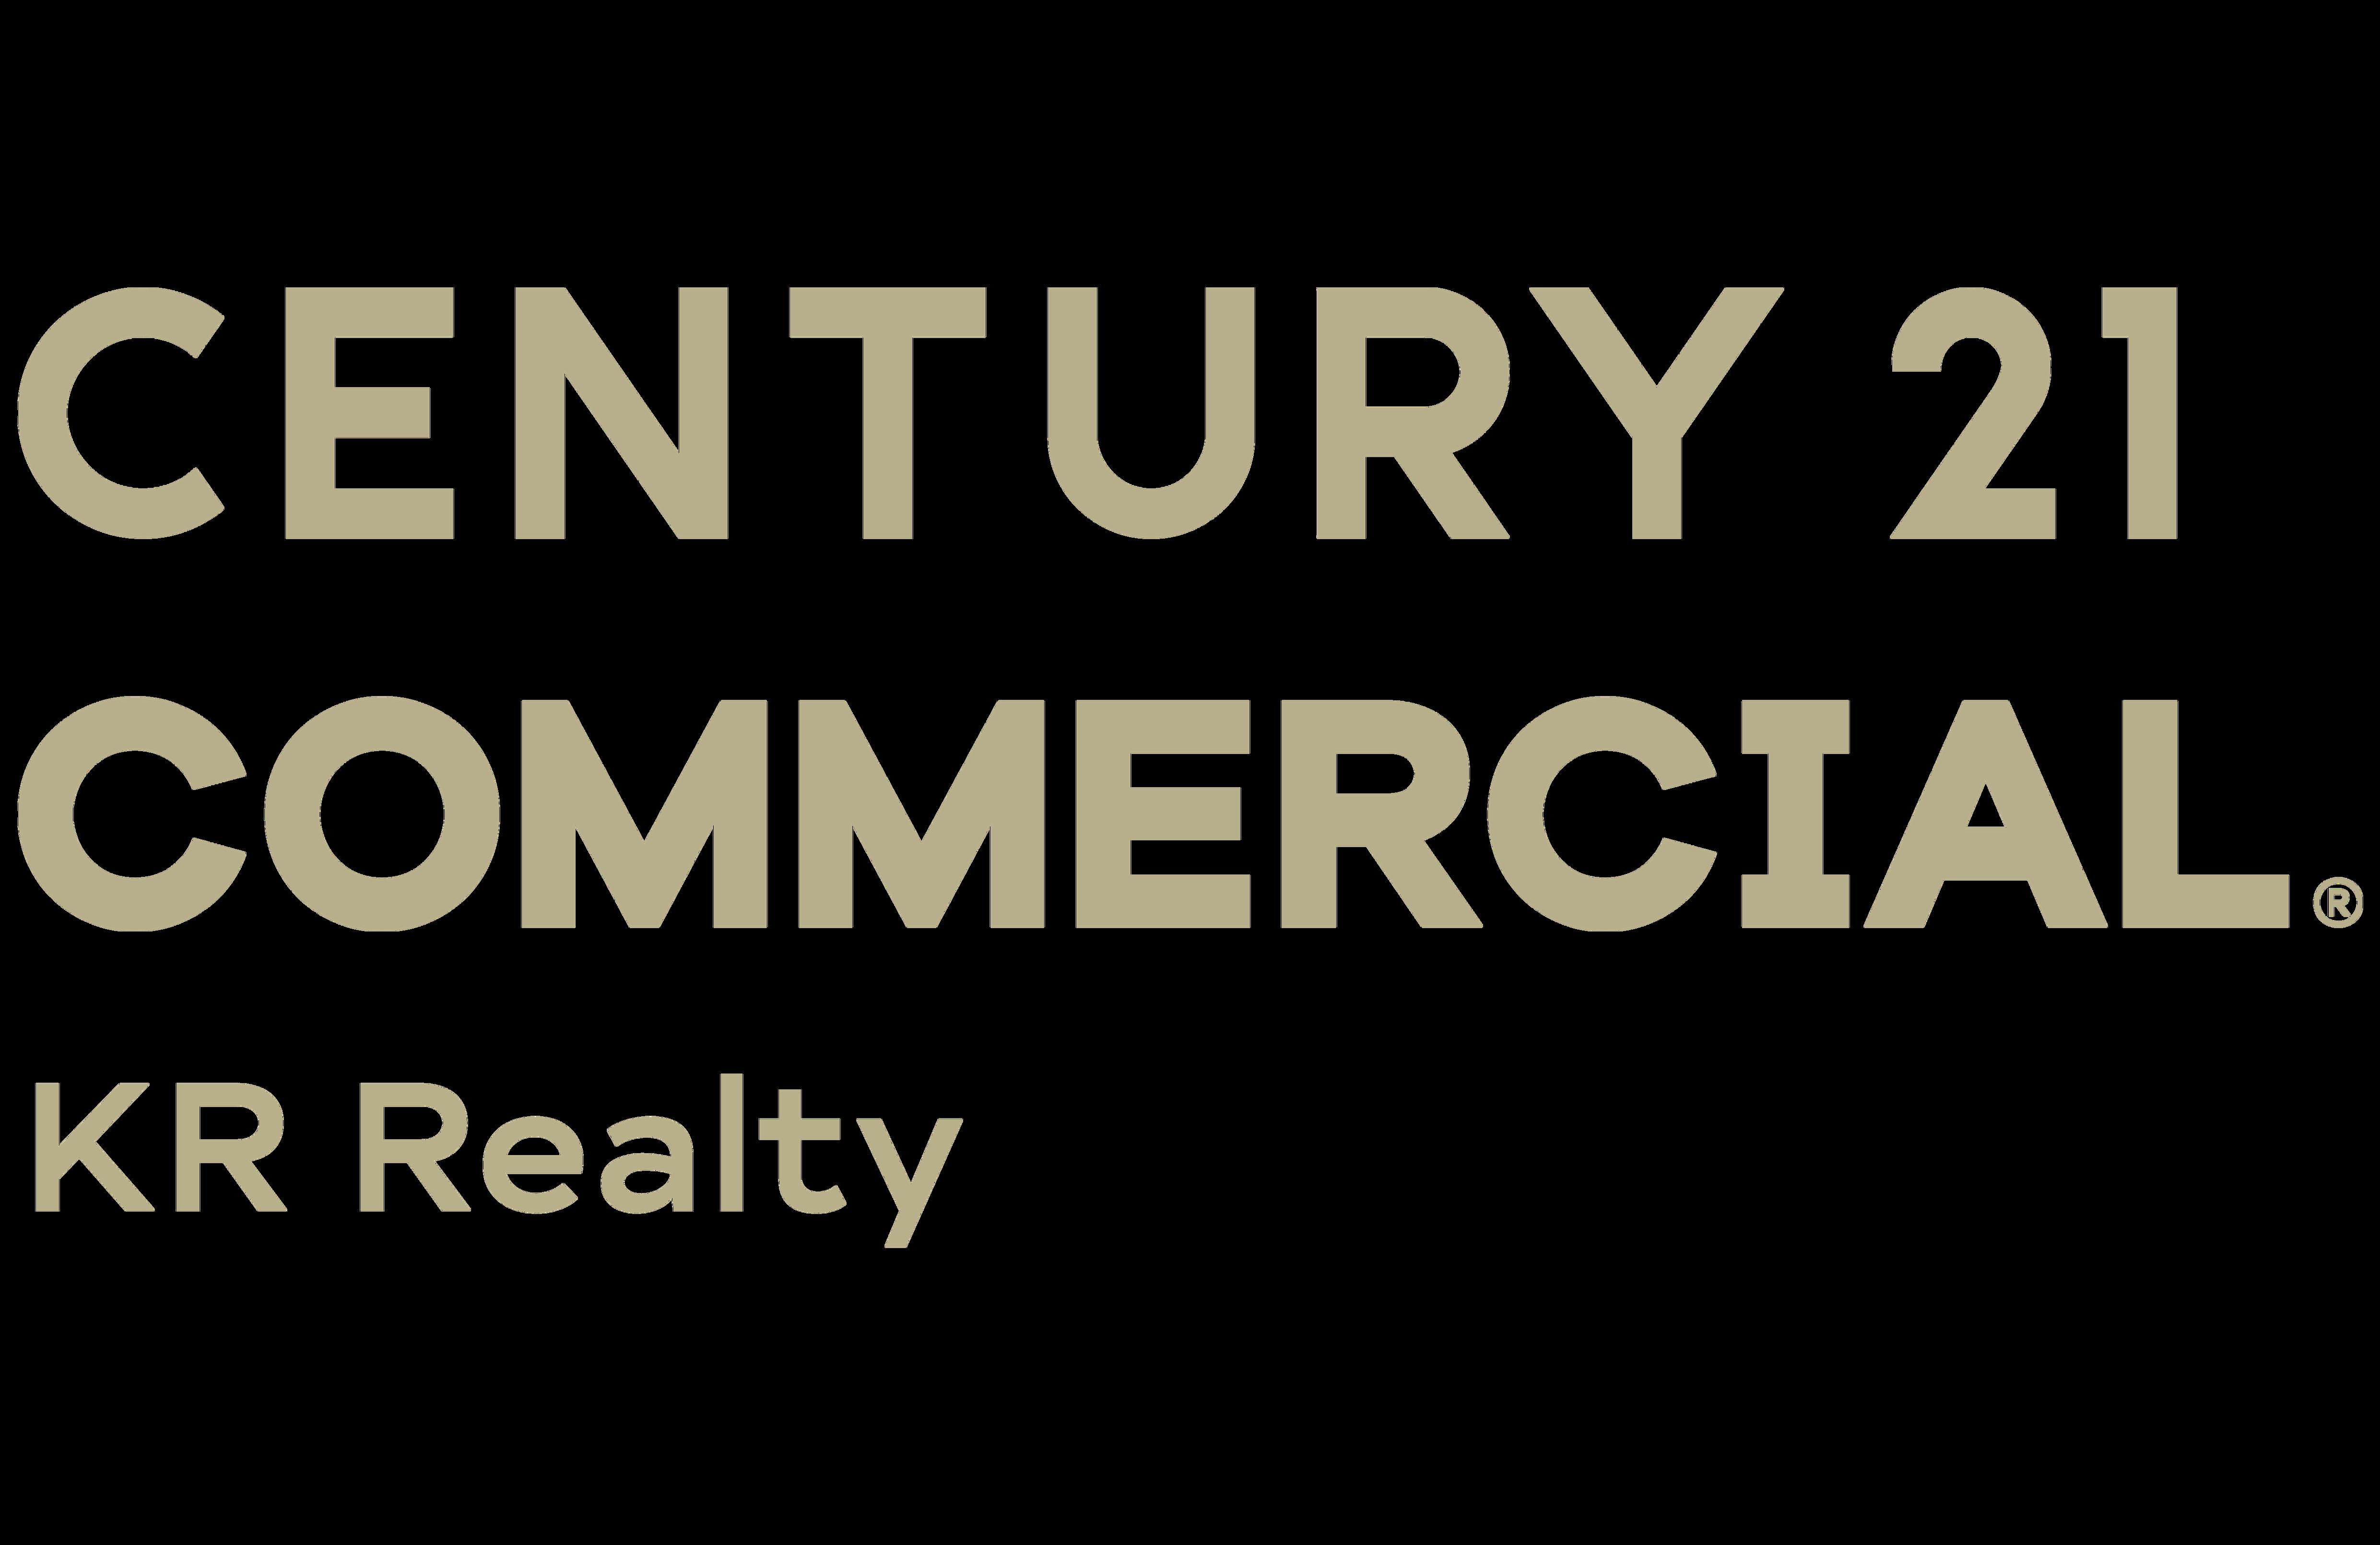 CENTURY 21 KR Realty